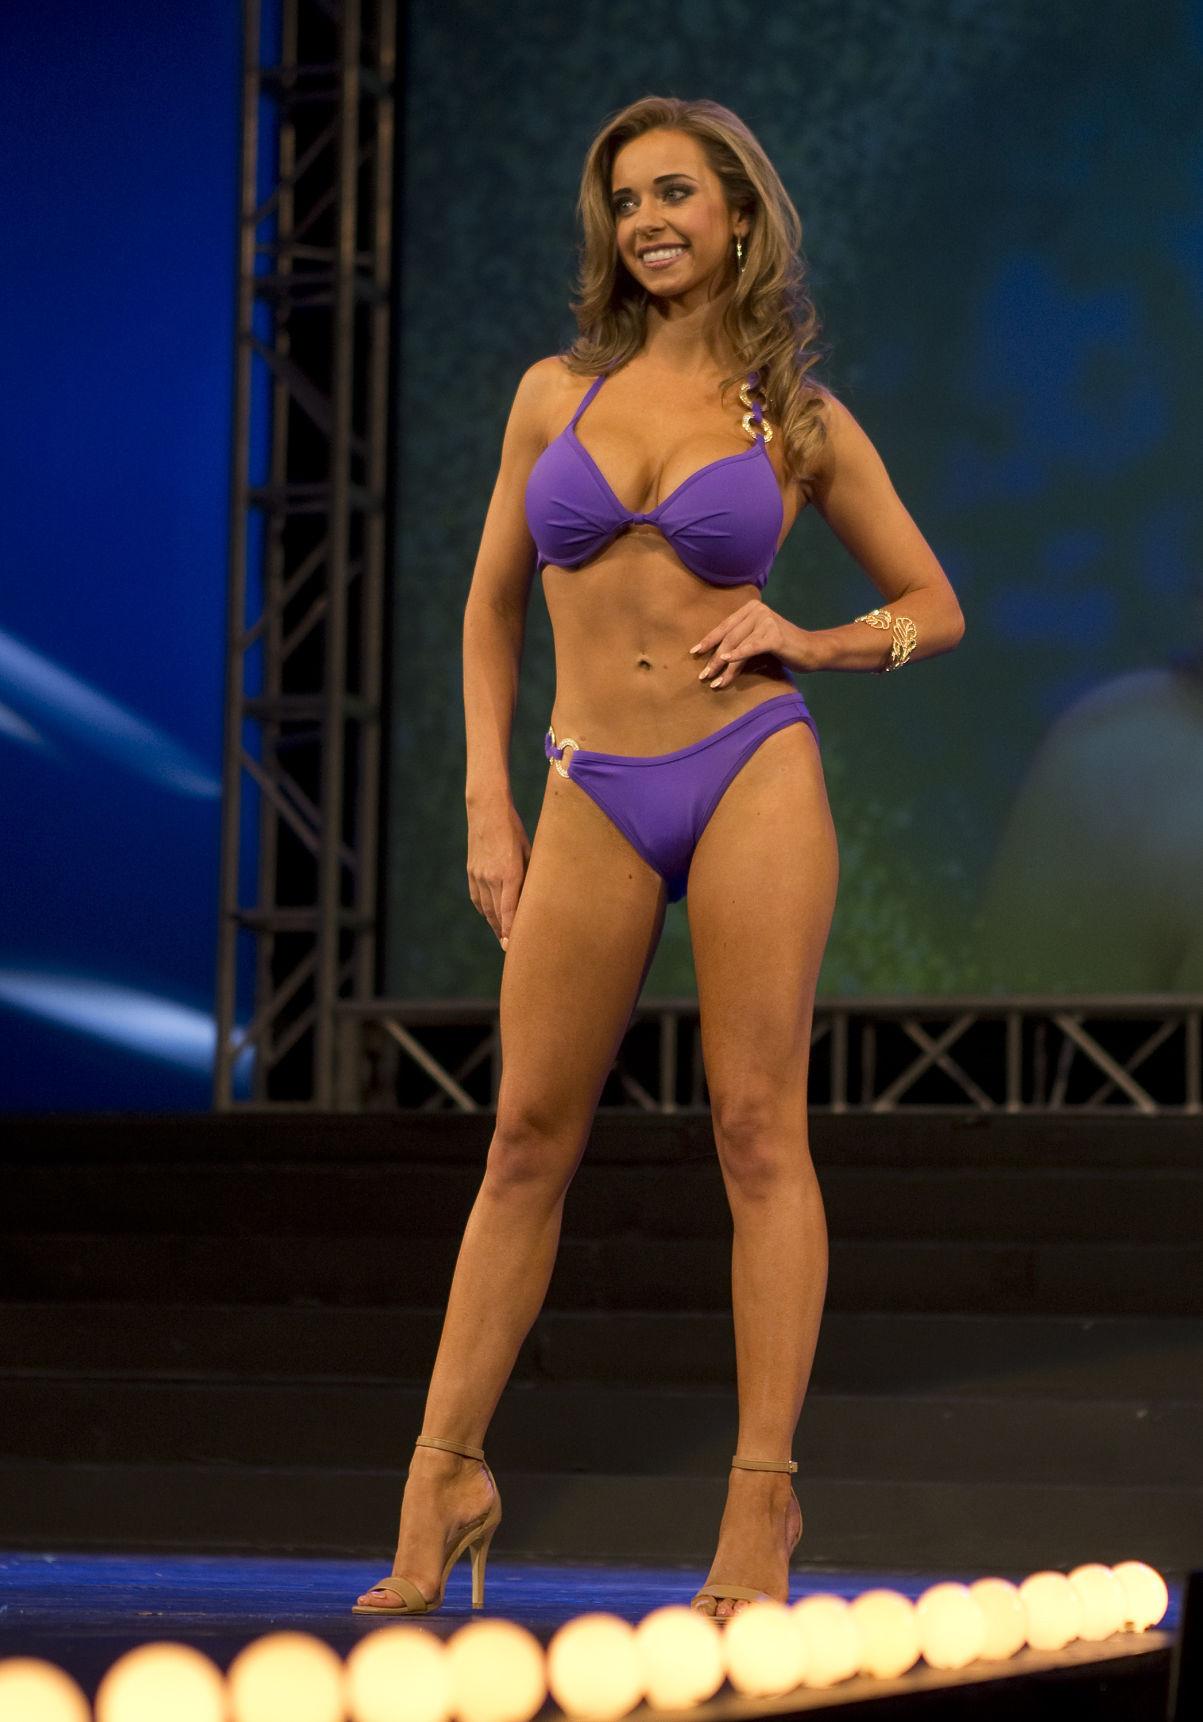 Bikini contest roanoke